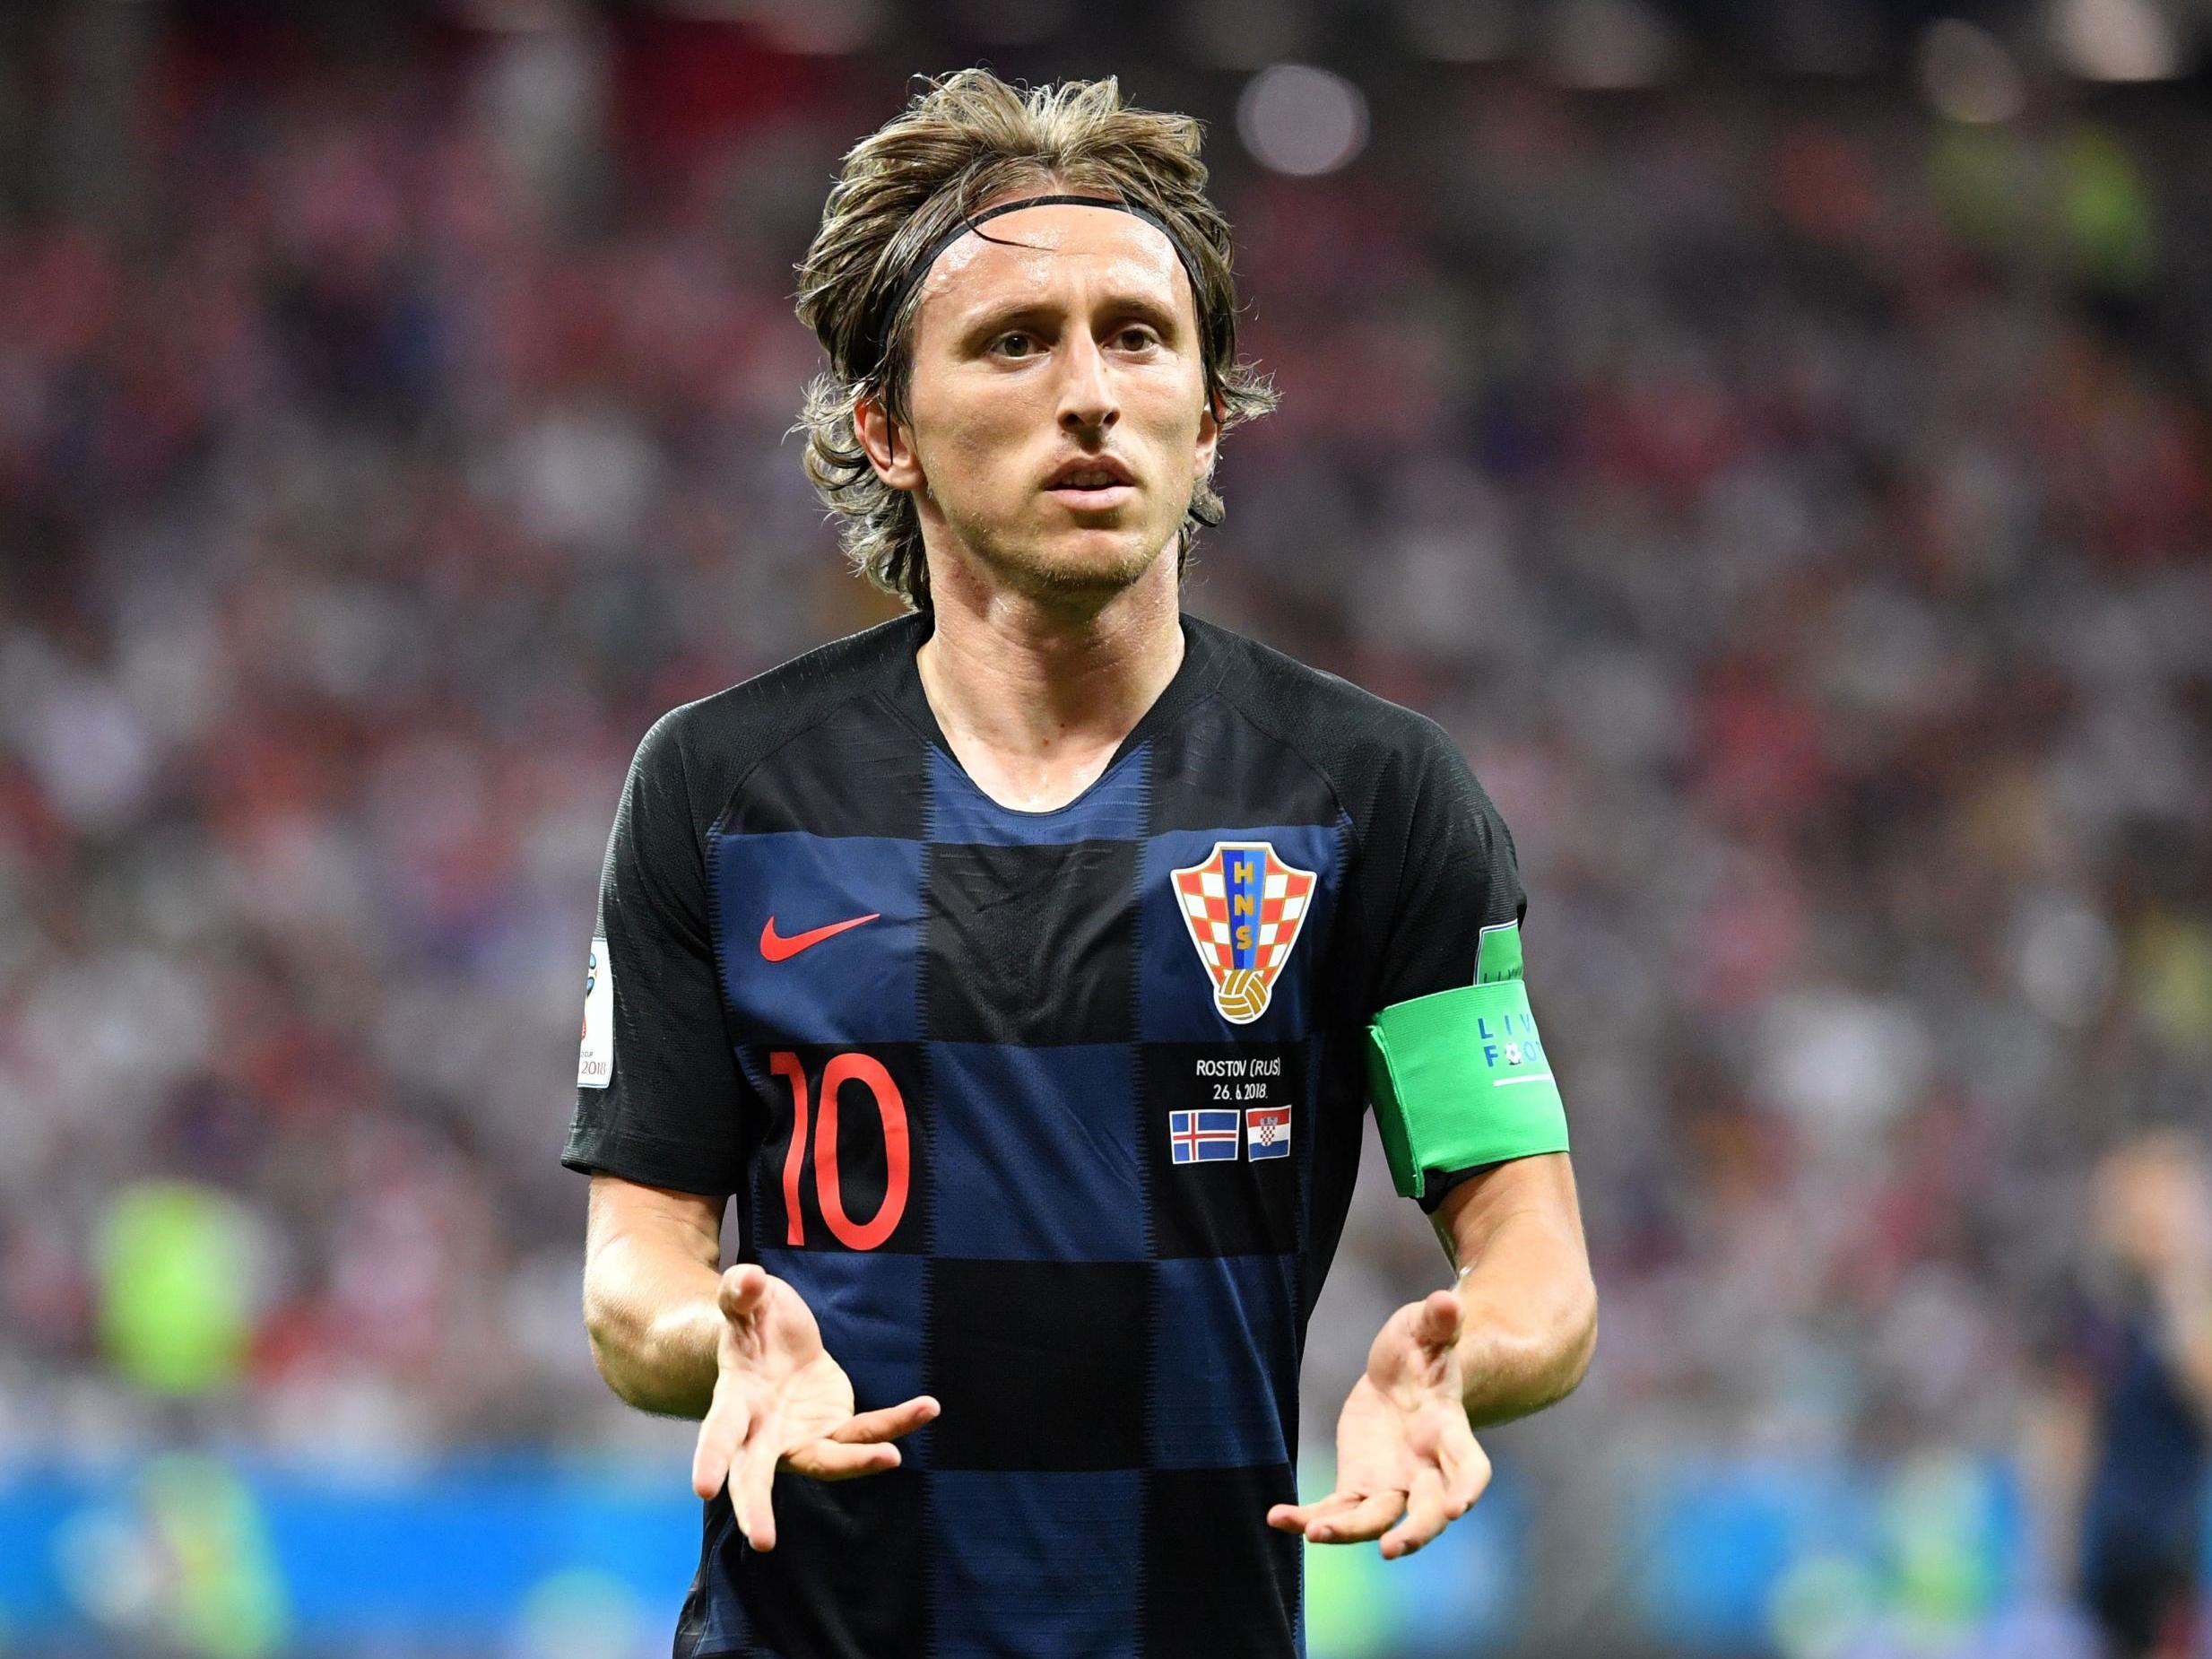 Luka Modric called up for World Cup duty with Croatia - Football Espana